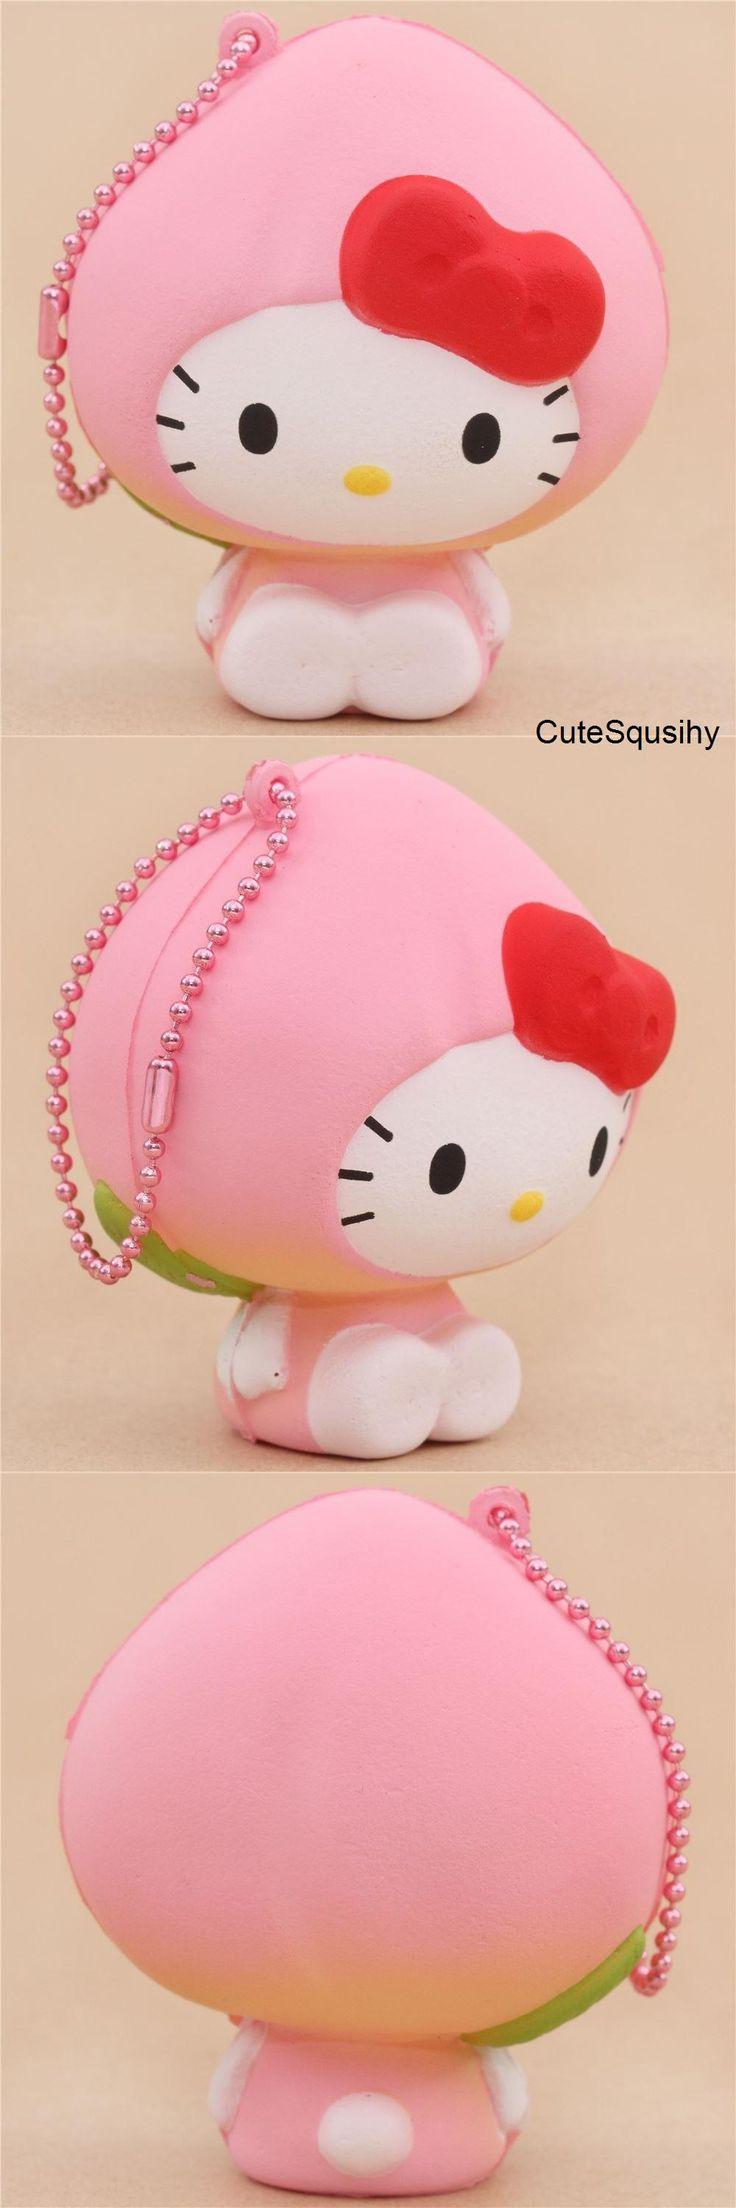 Kawaii Sanrio Hello Kitty in peach costume squishy!